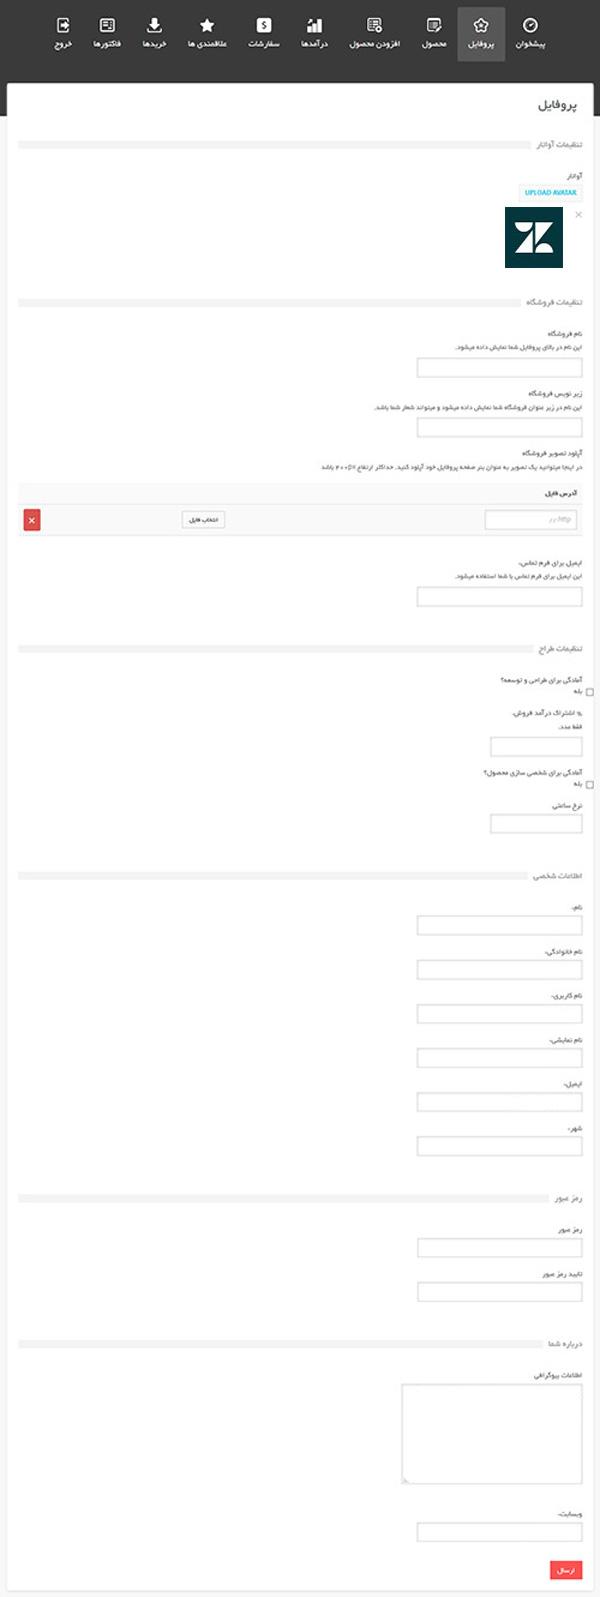 قالب مارکت وردپرس - قالب فروش فایل